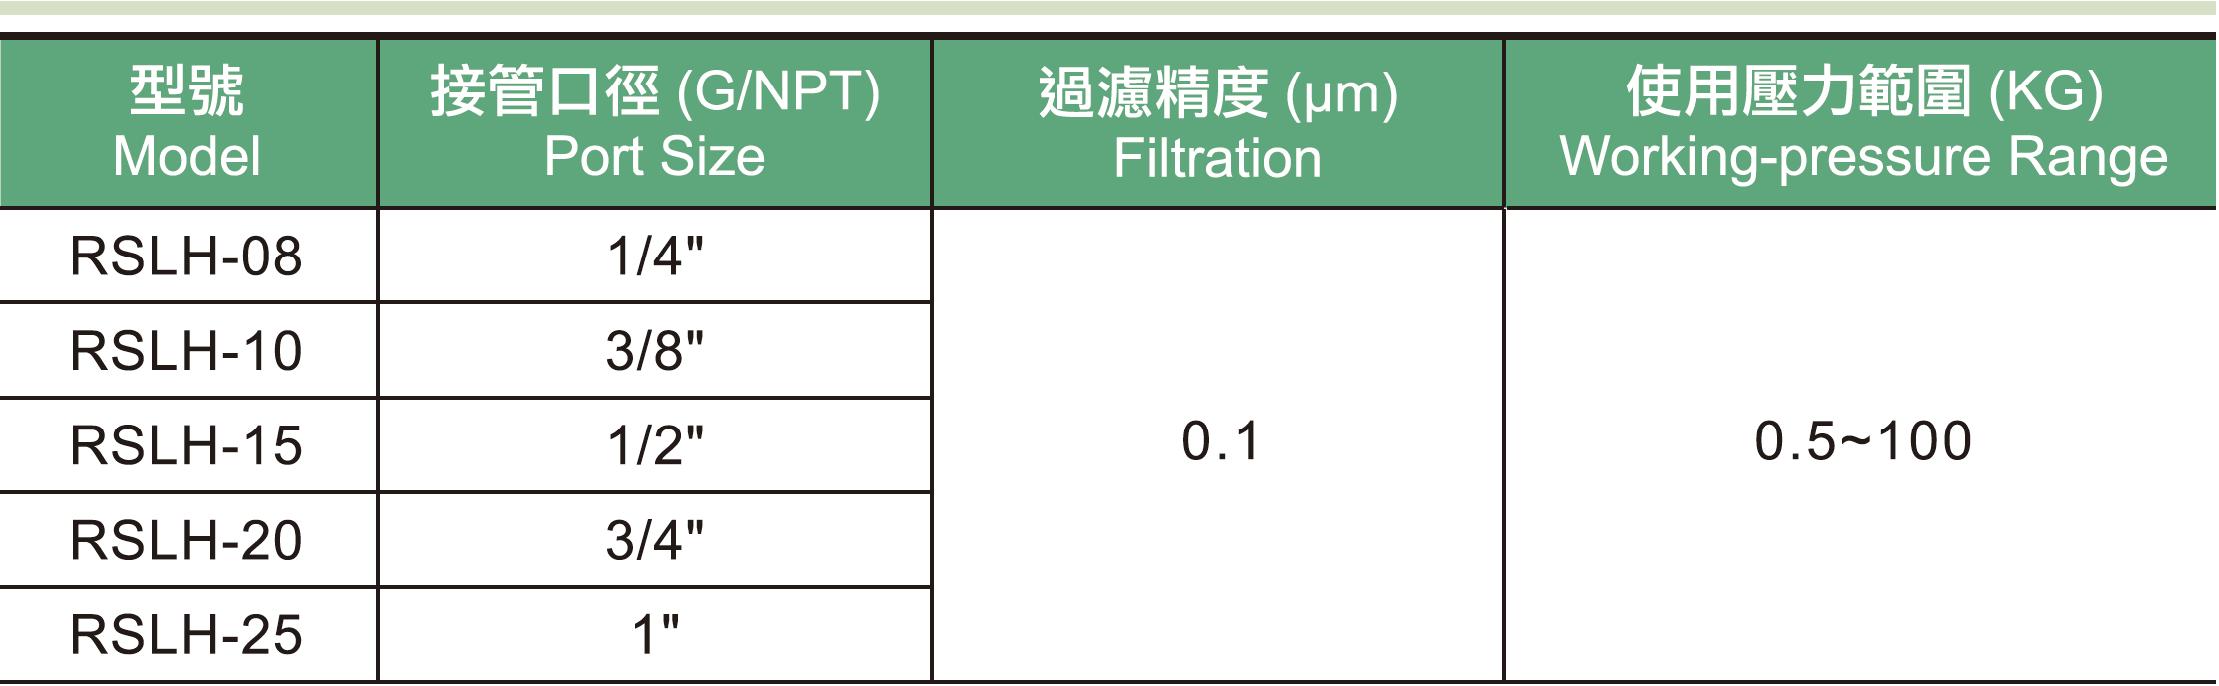 01.RSLH系列高壓過濾器規格表.png